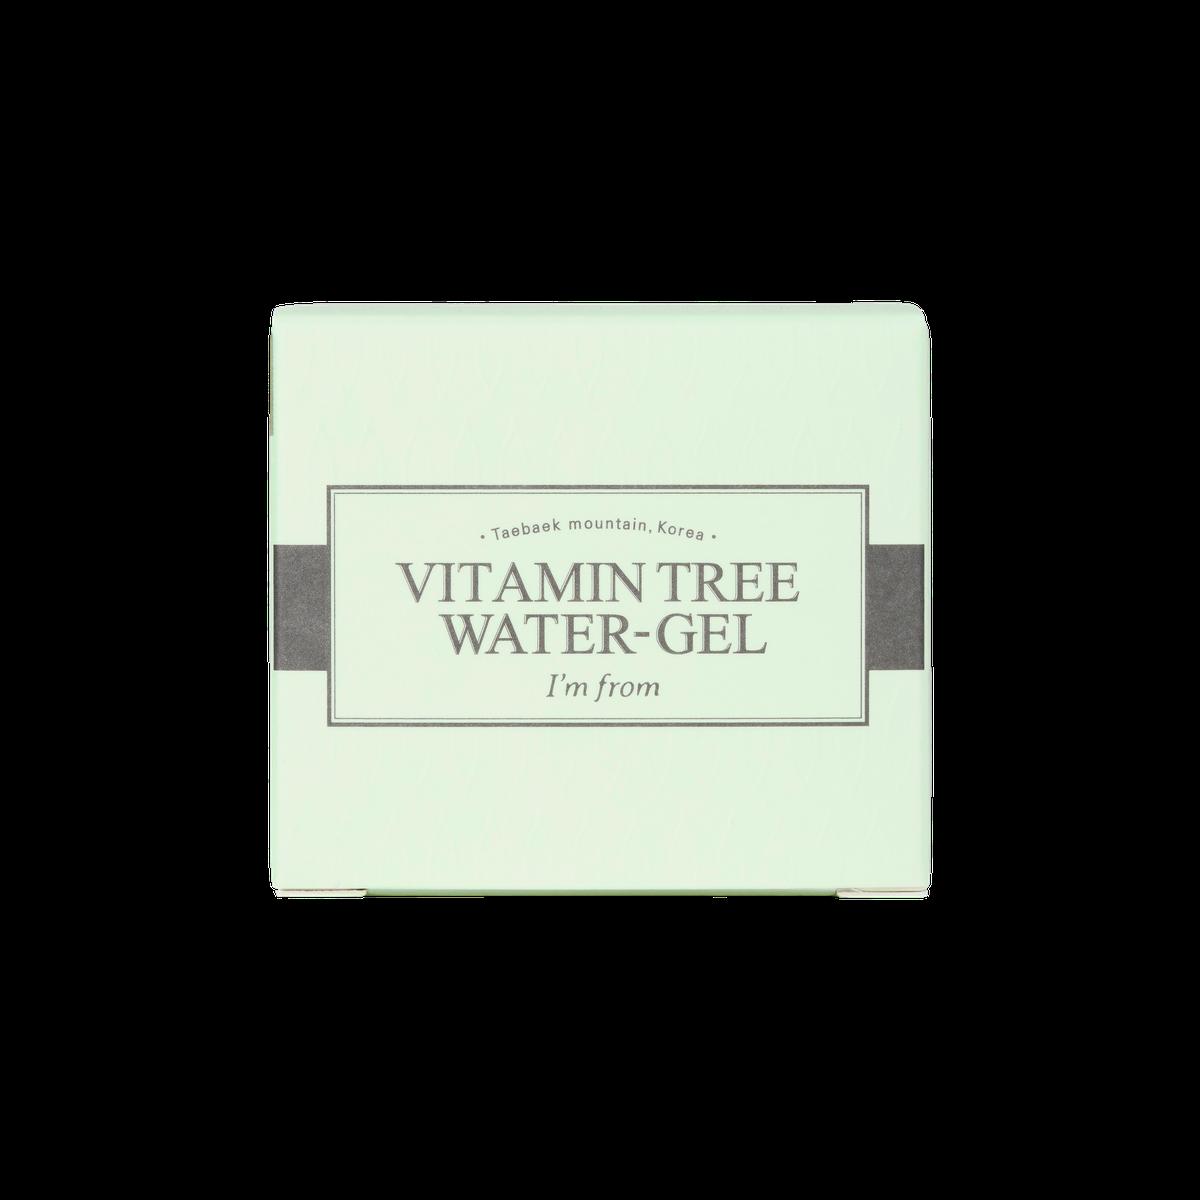 Kem dưỡng ẩm I'm from Vitamin Tree Water-gel 75G